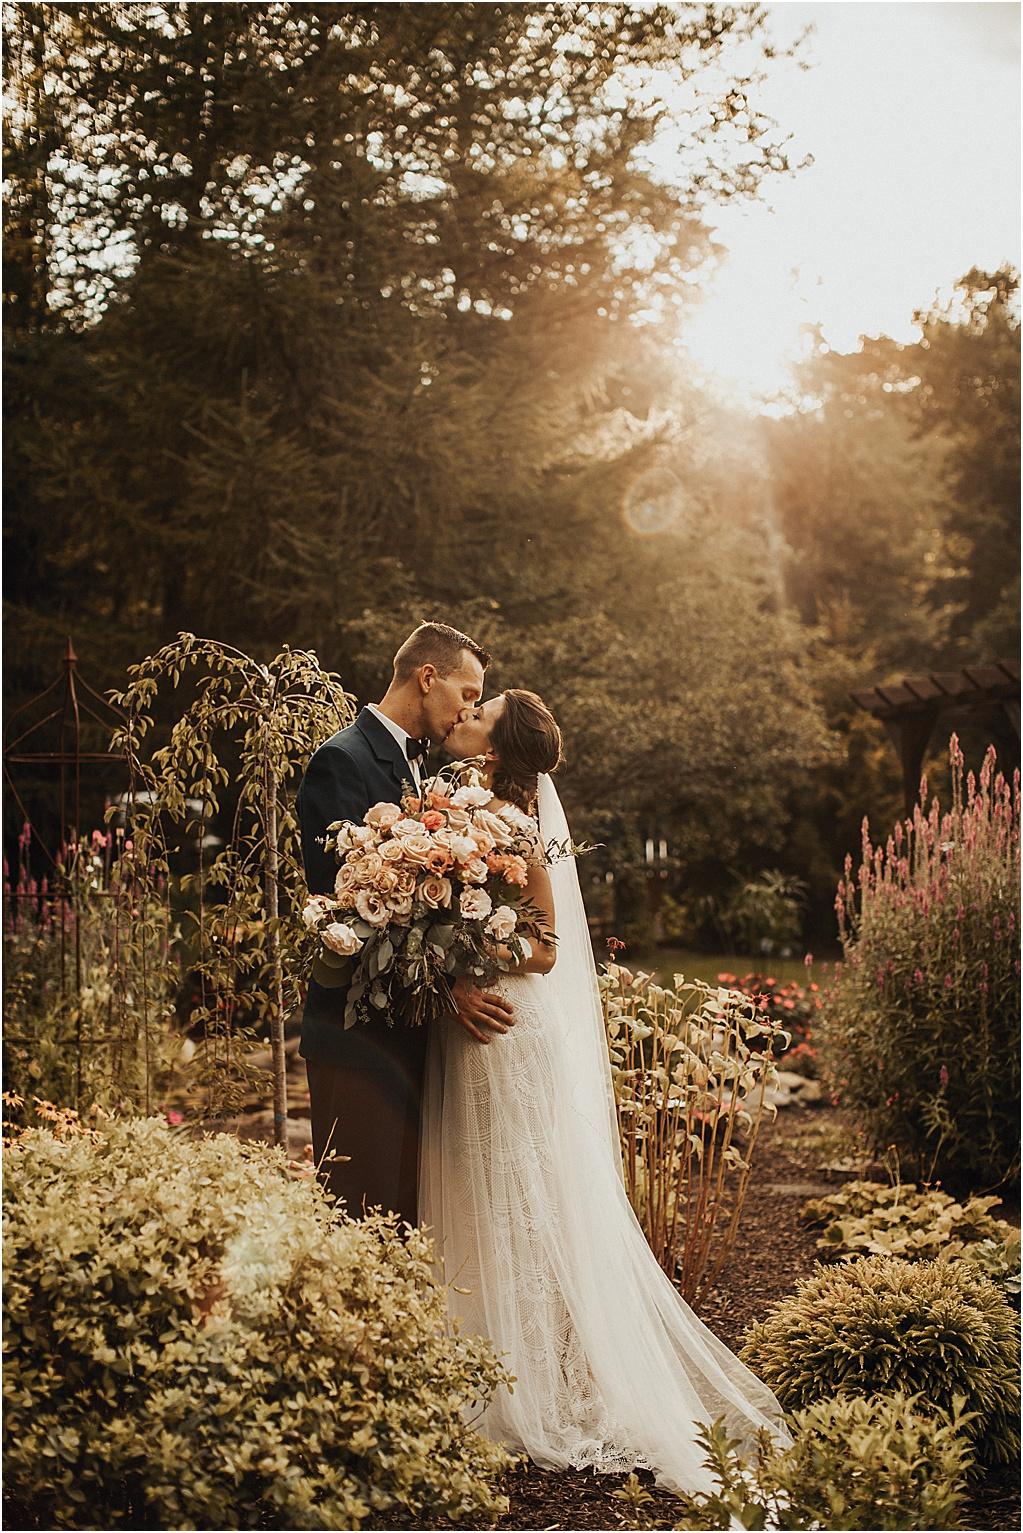 brittany_boote_pennsylvania_wedding_photographer_0643.jpg